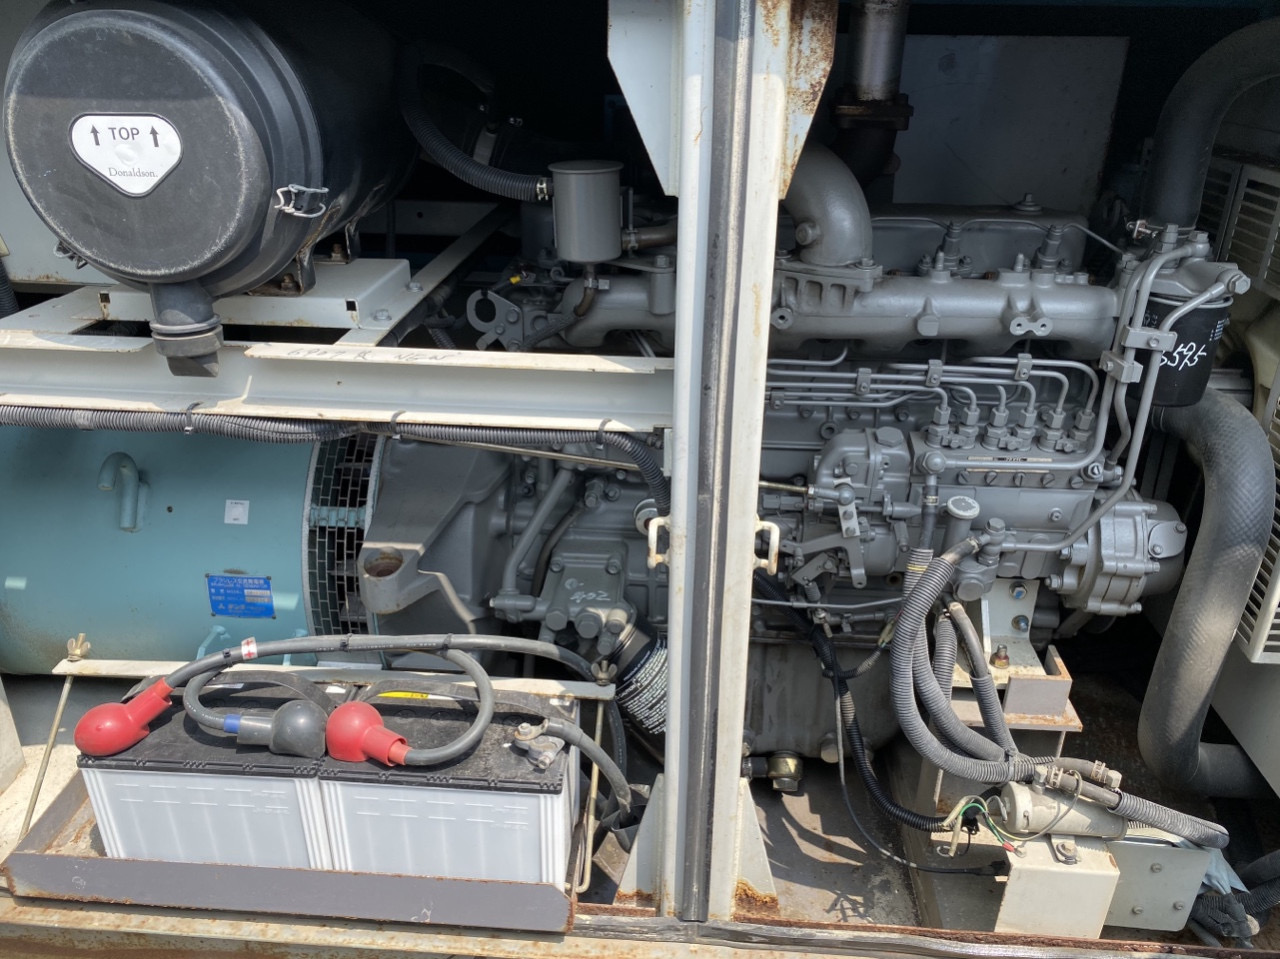 máy phát điện 60kva nhập khẩu